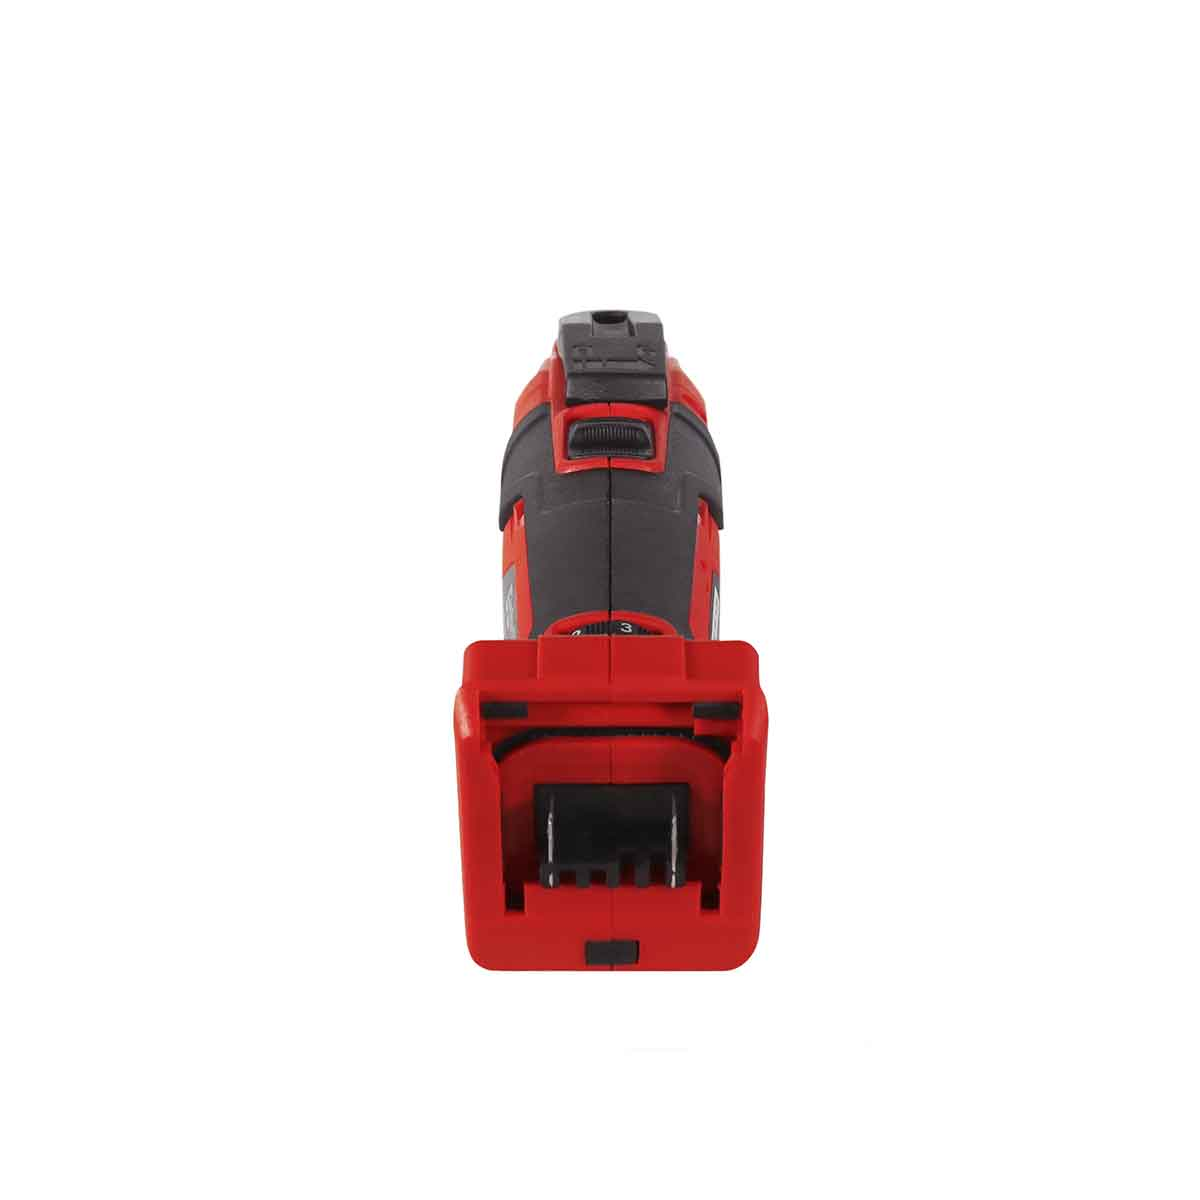 Ferramenta Multifuncional a Bateria 18V Einhell Varrito